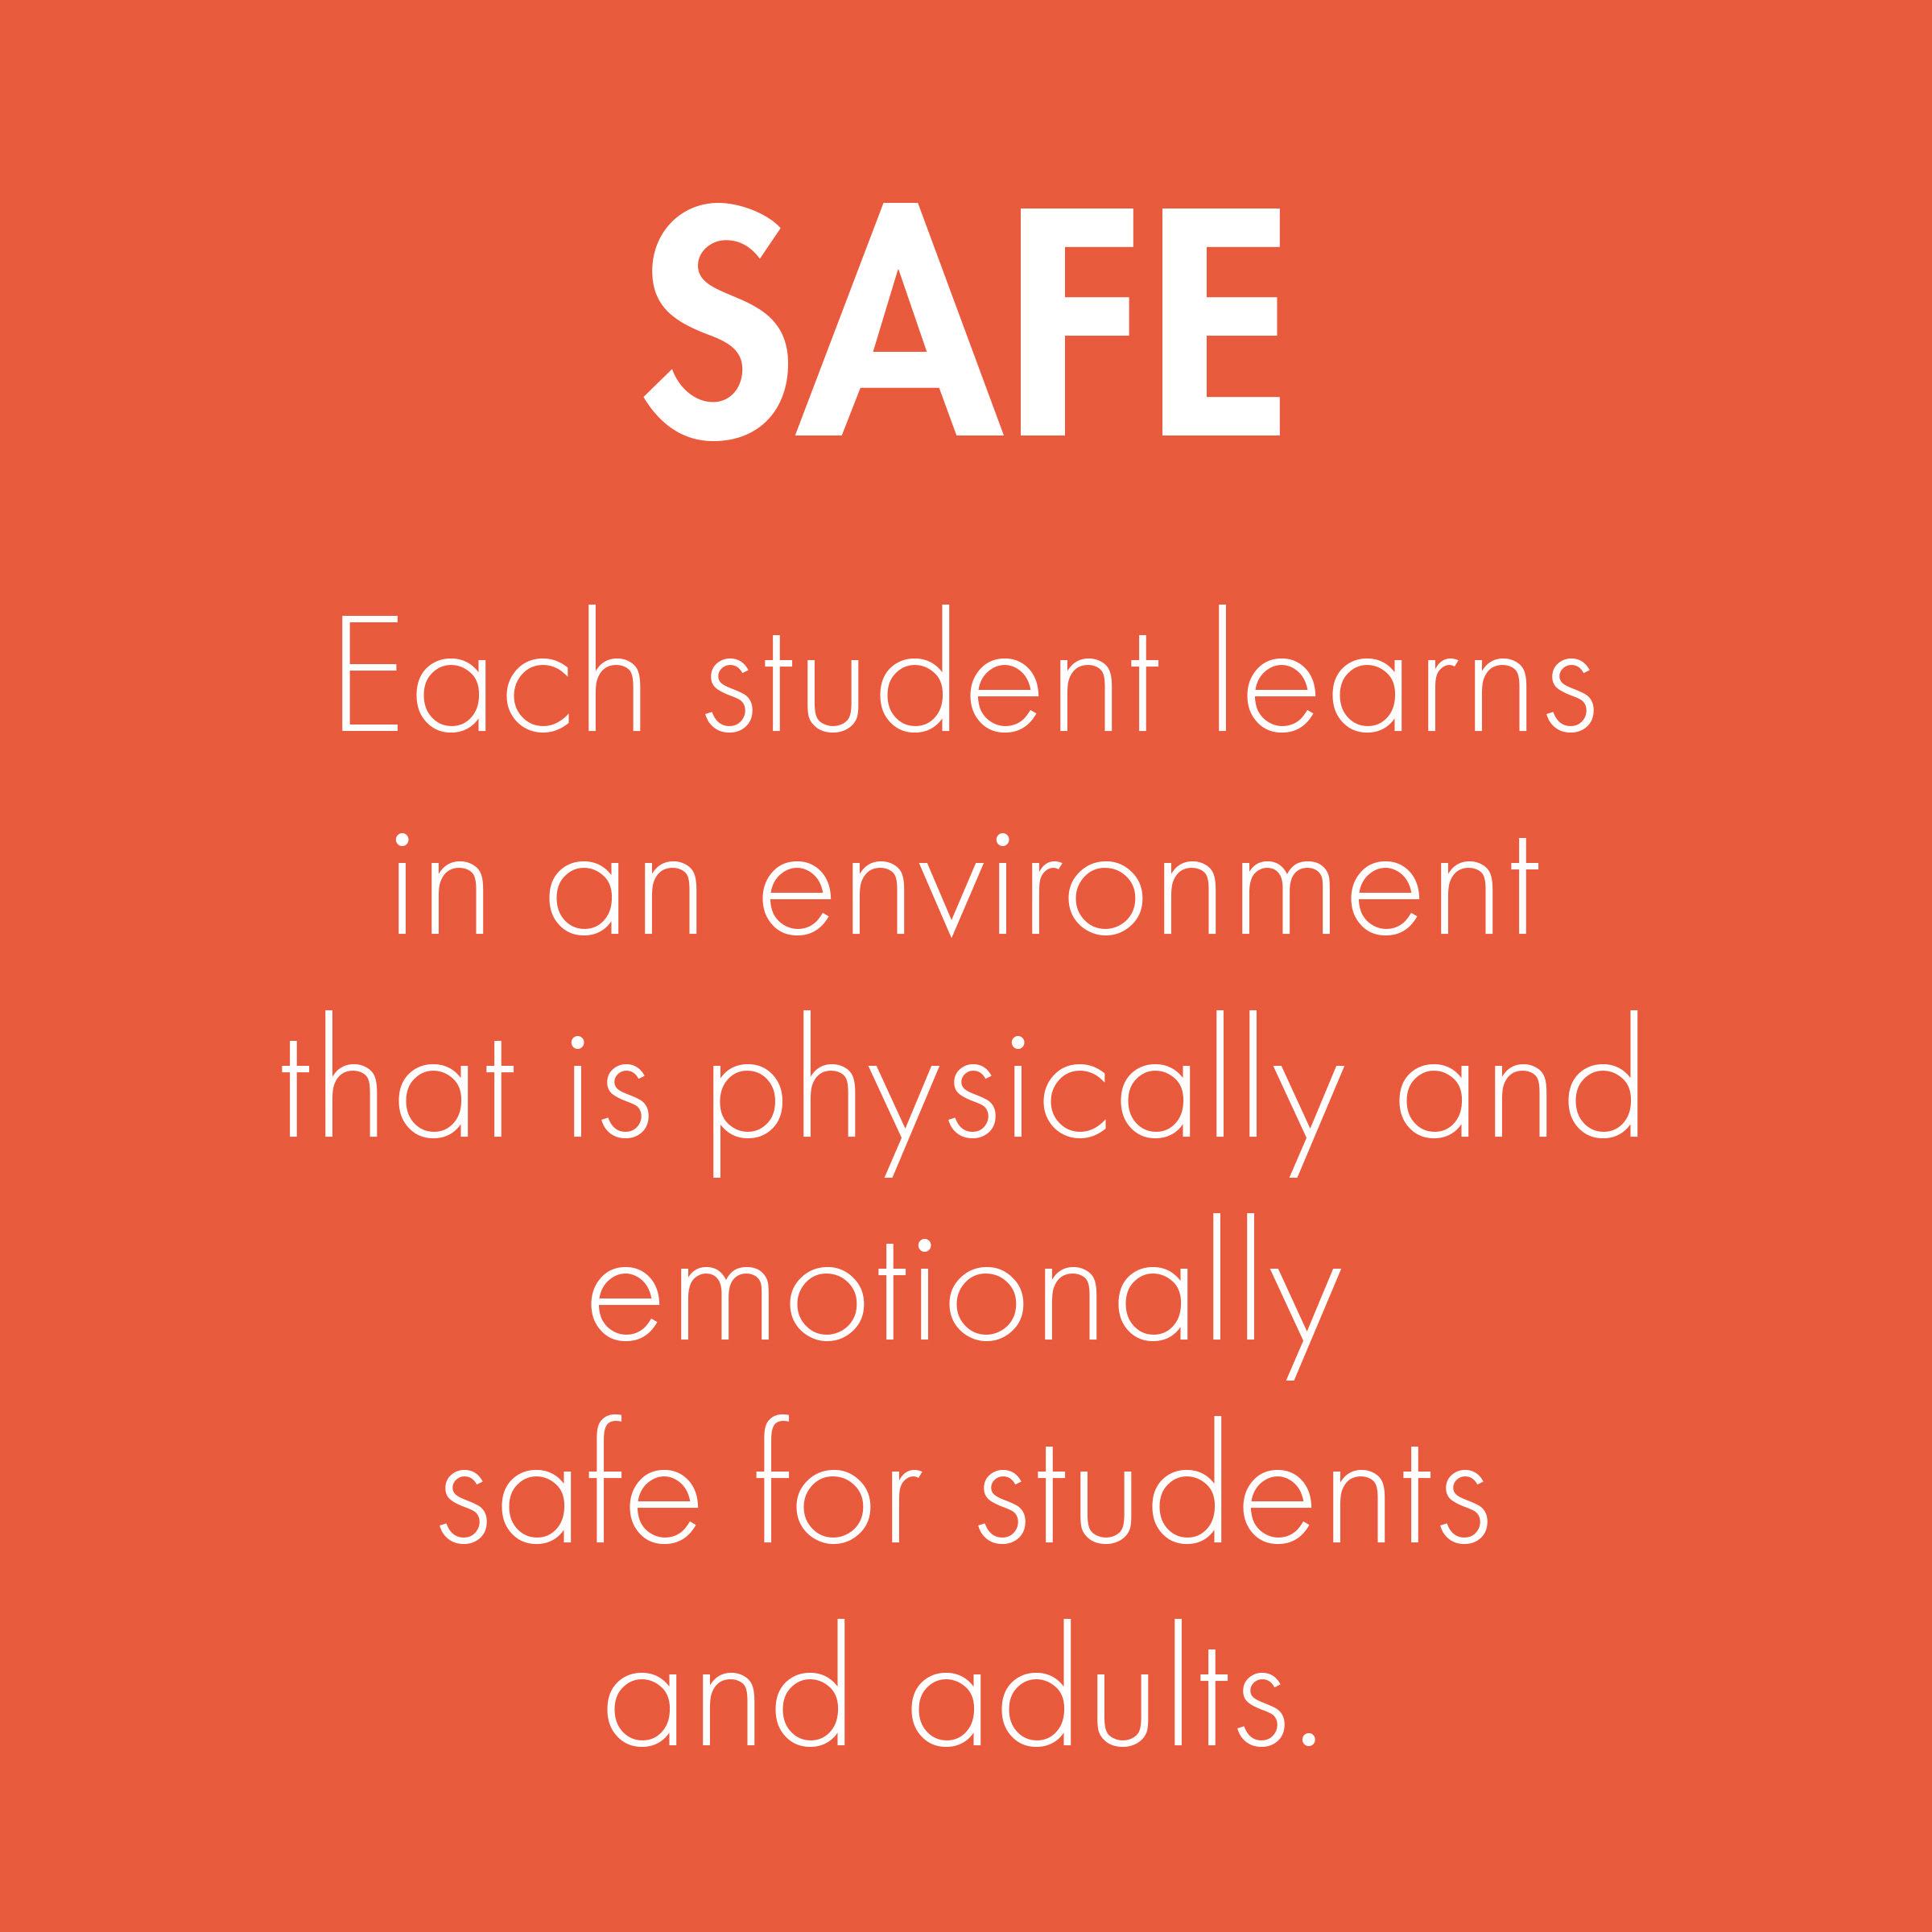 Student learning image by California Teachers Associatio